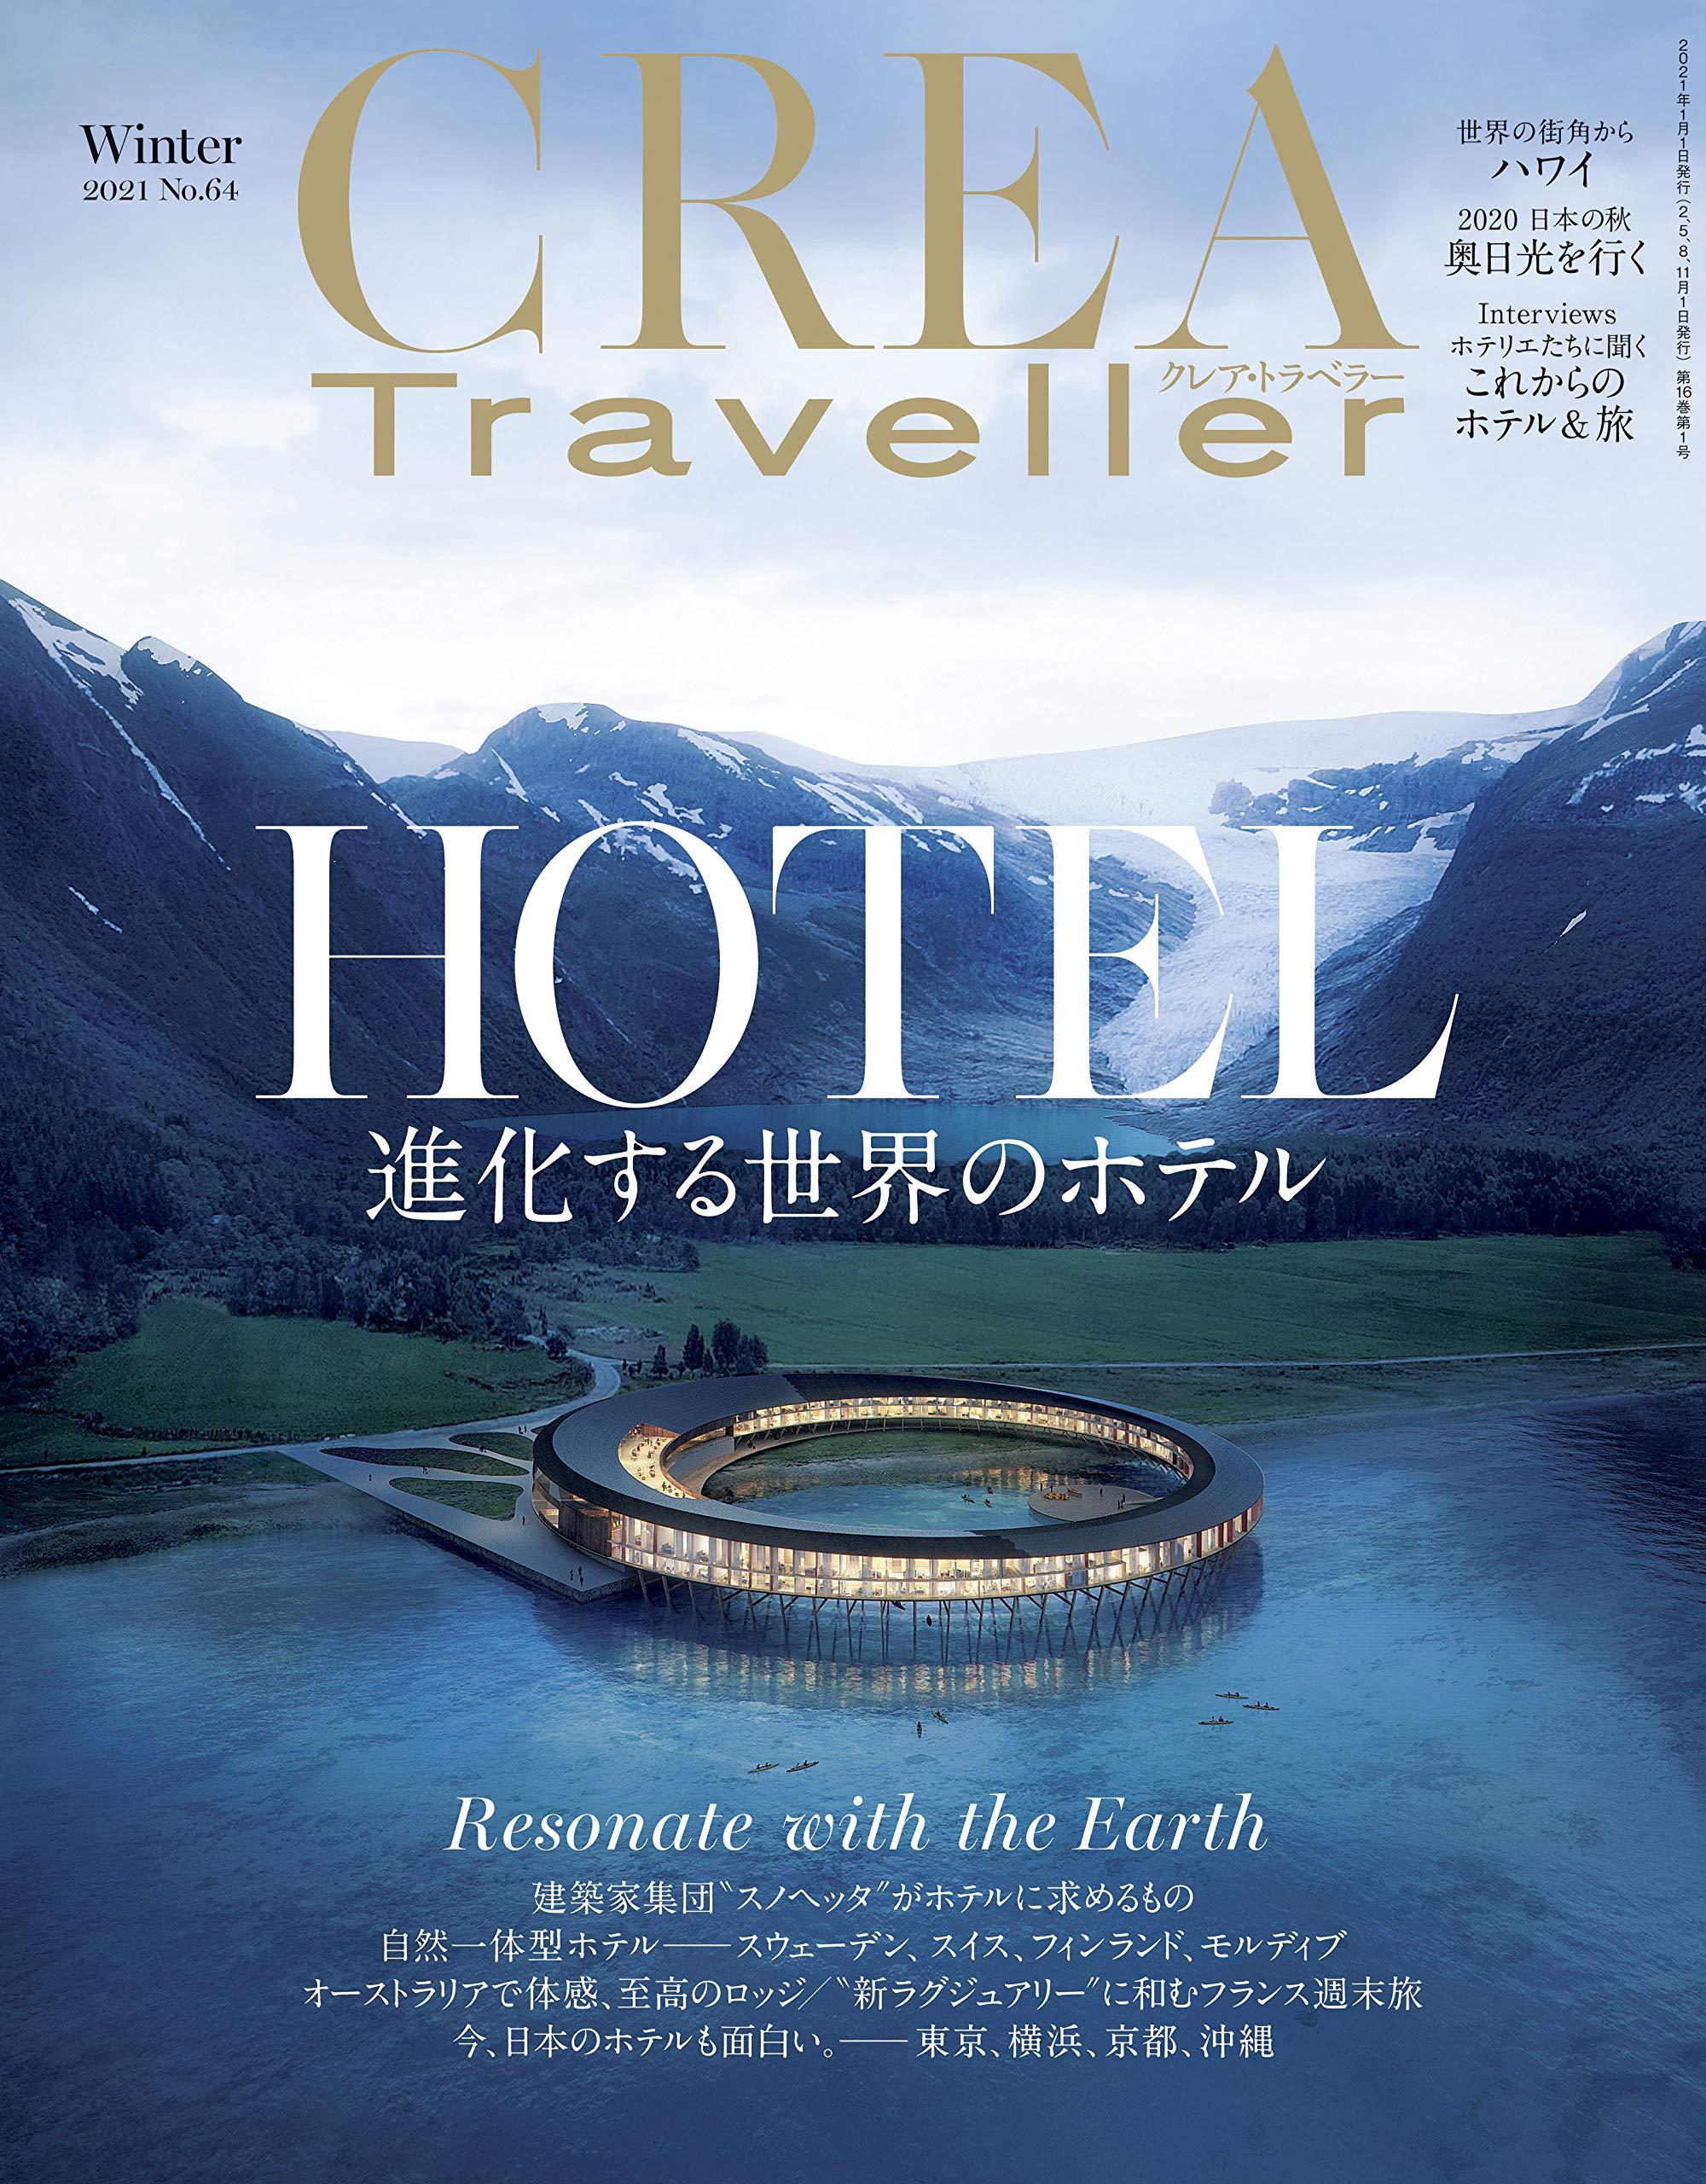 CREA Traveller 21年冬号 (HOTEL 進化する世界のホテル) に掲載されました。